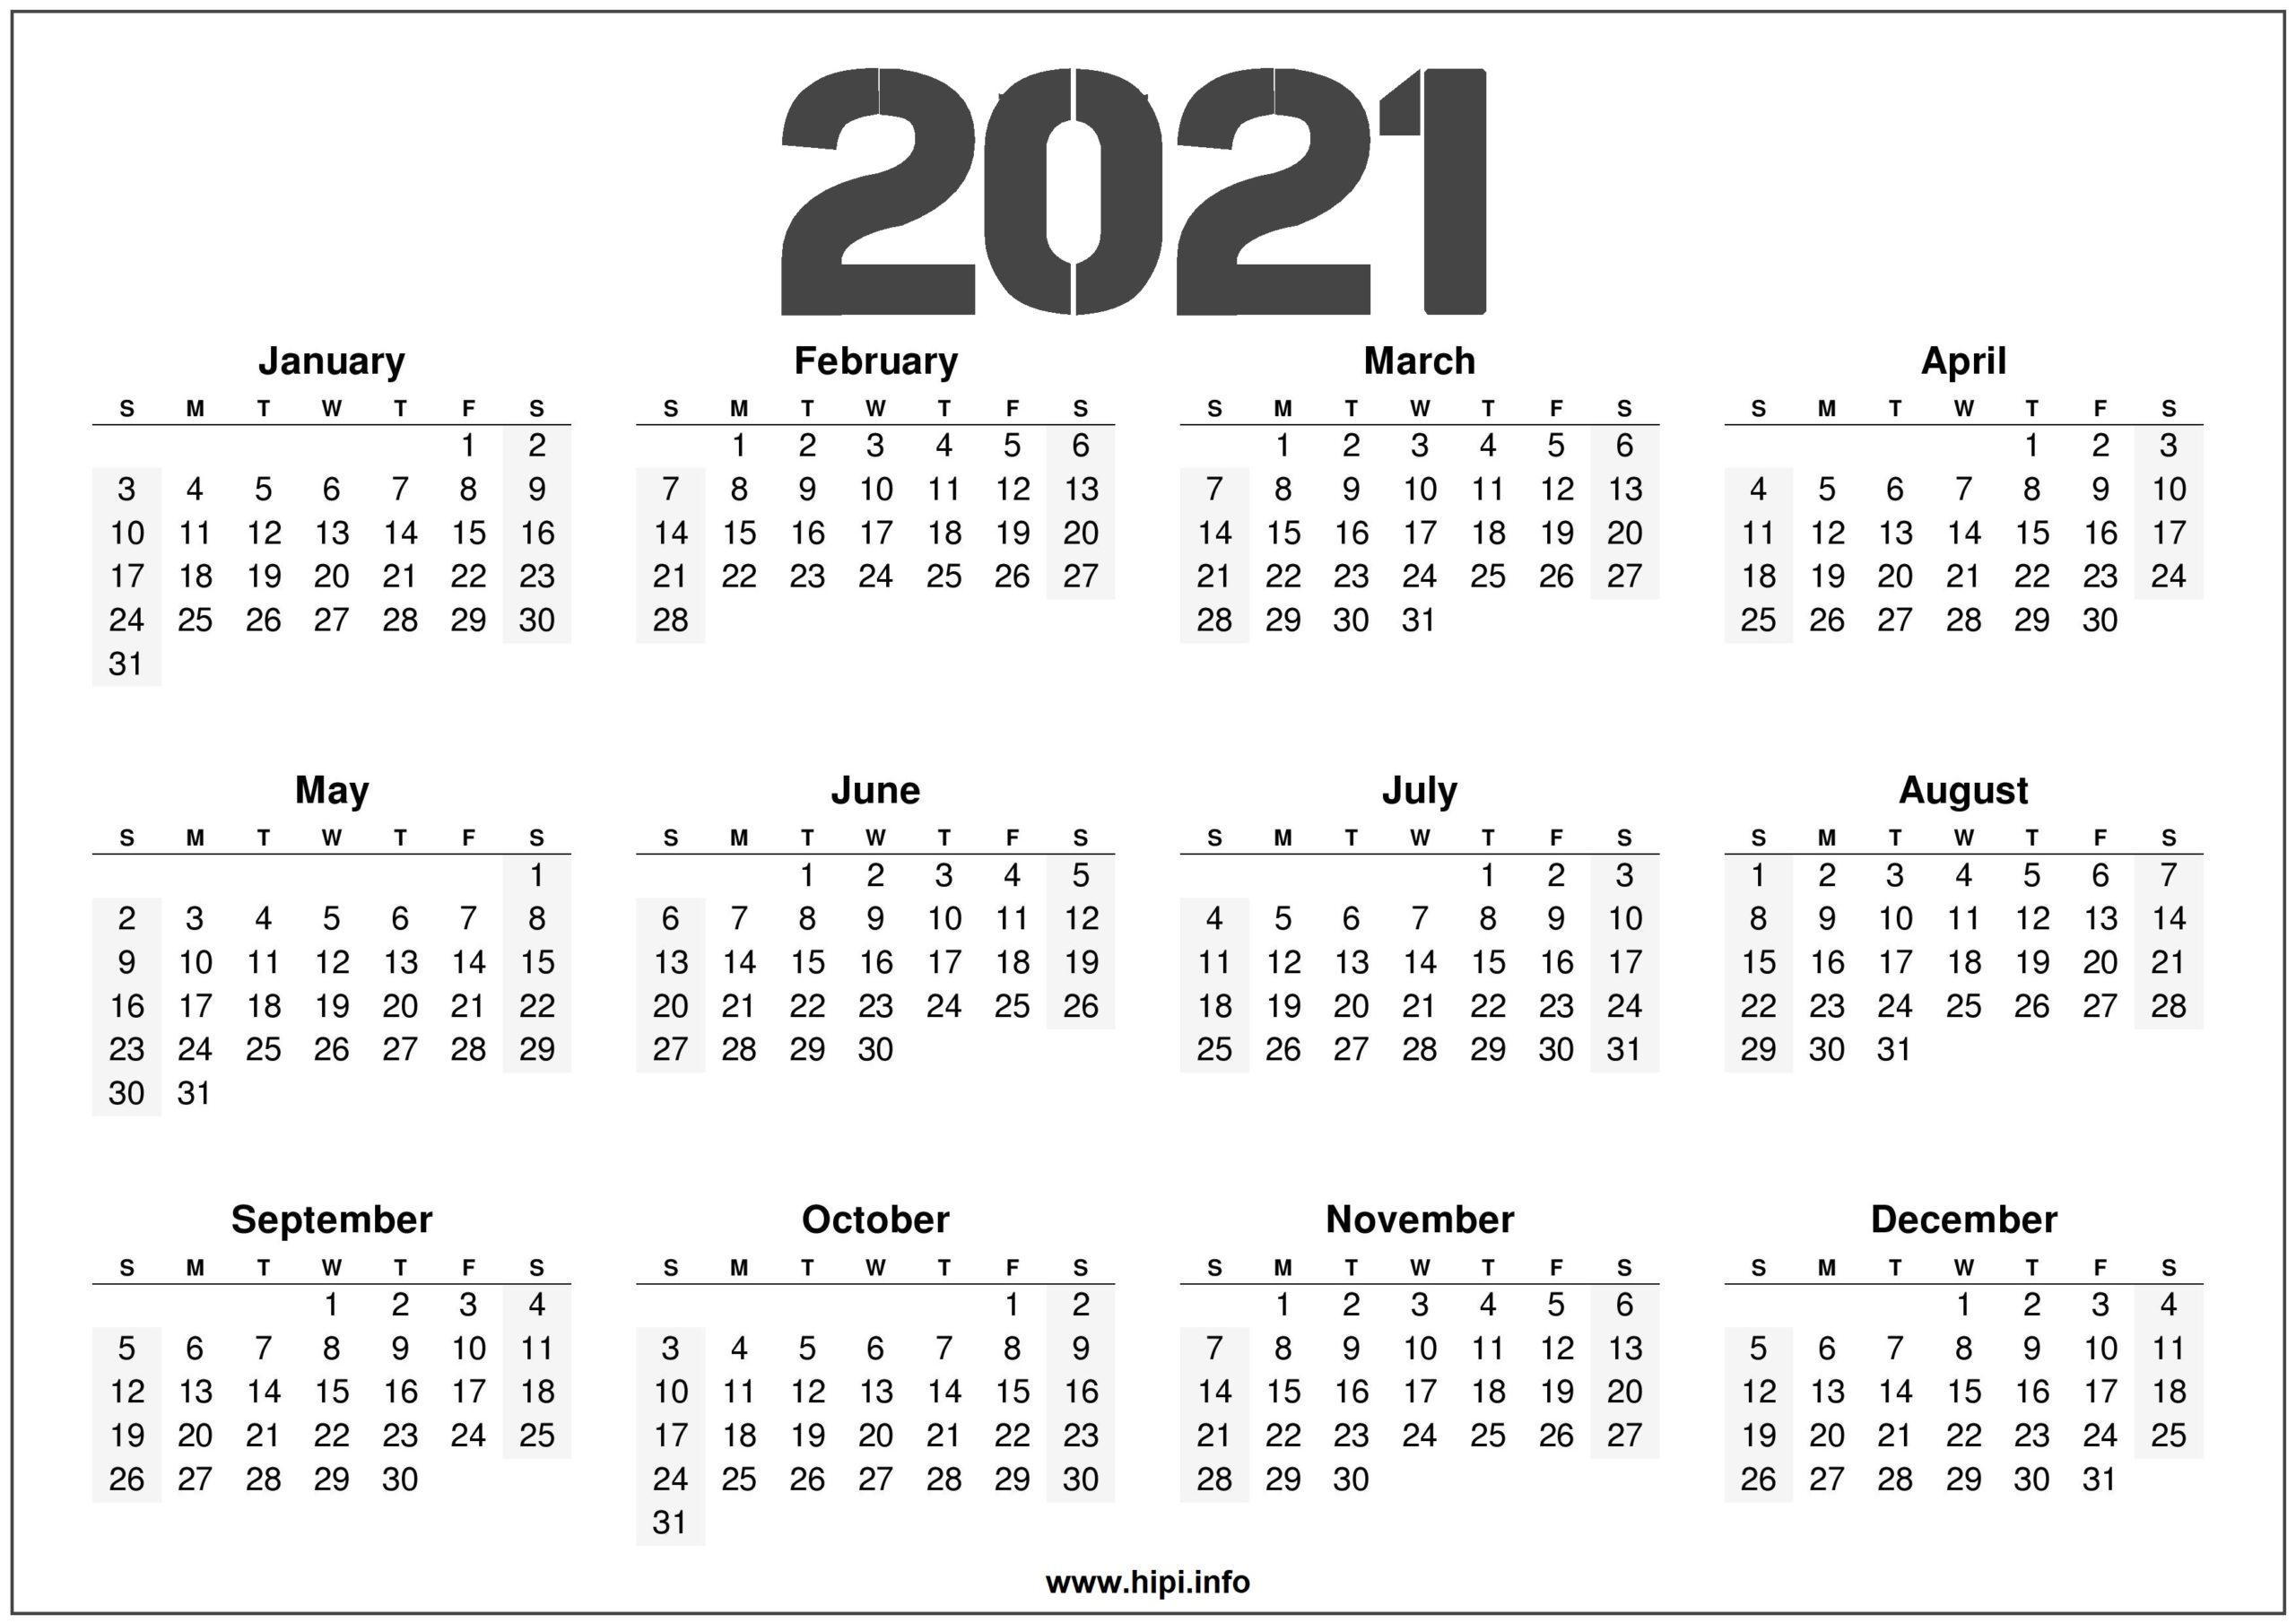 Full Year 12 Month 2021 Calendar Printable | Printable March